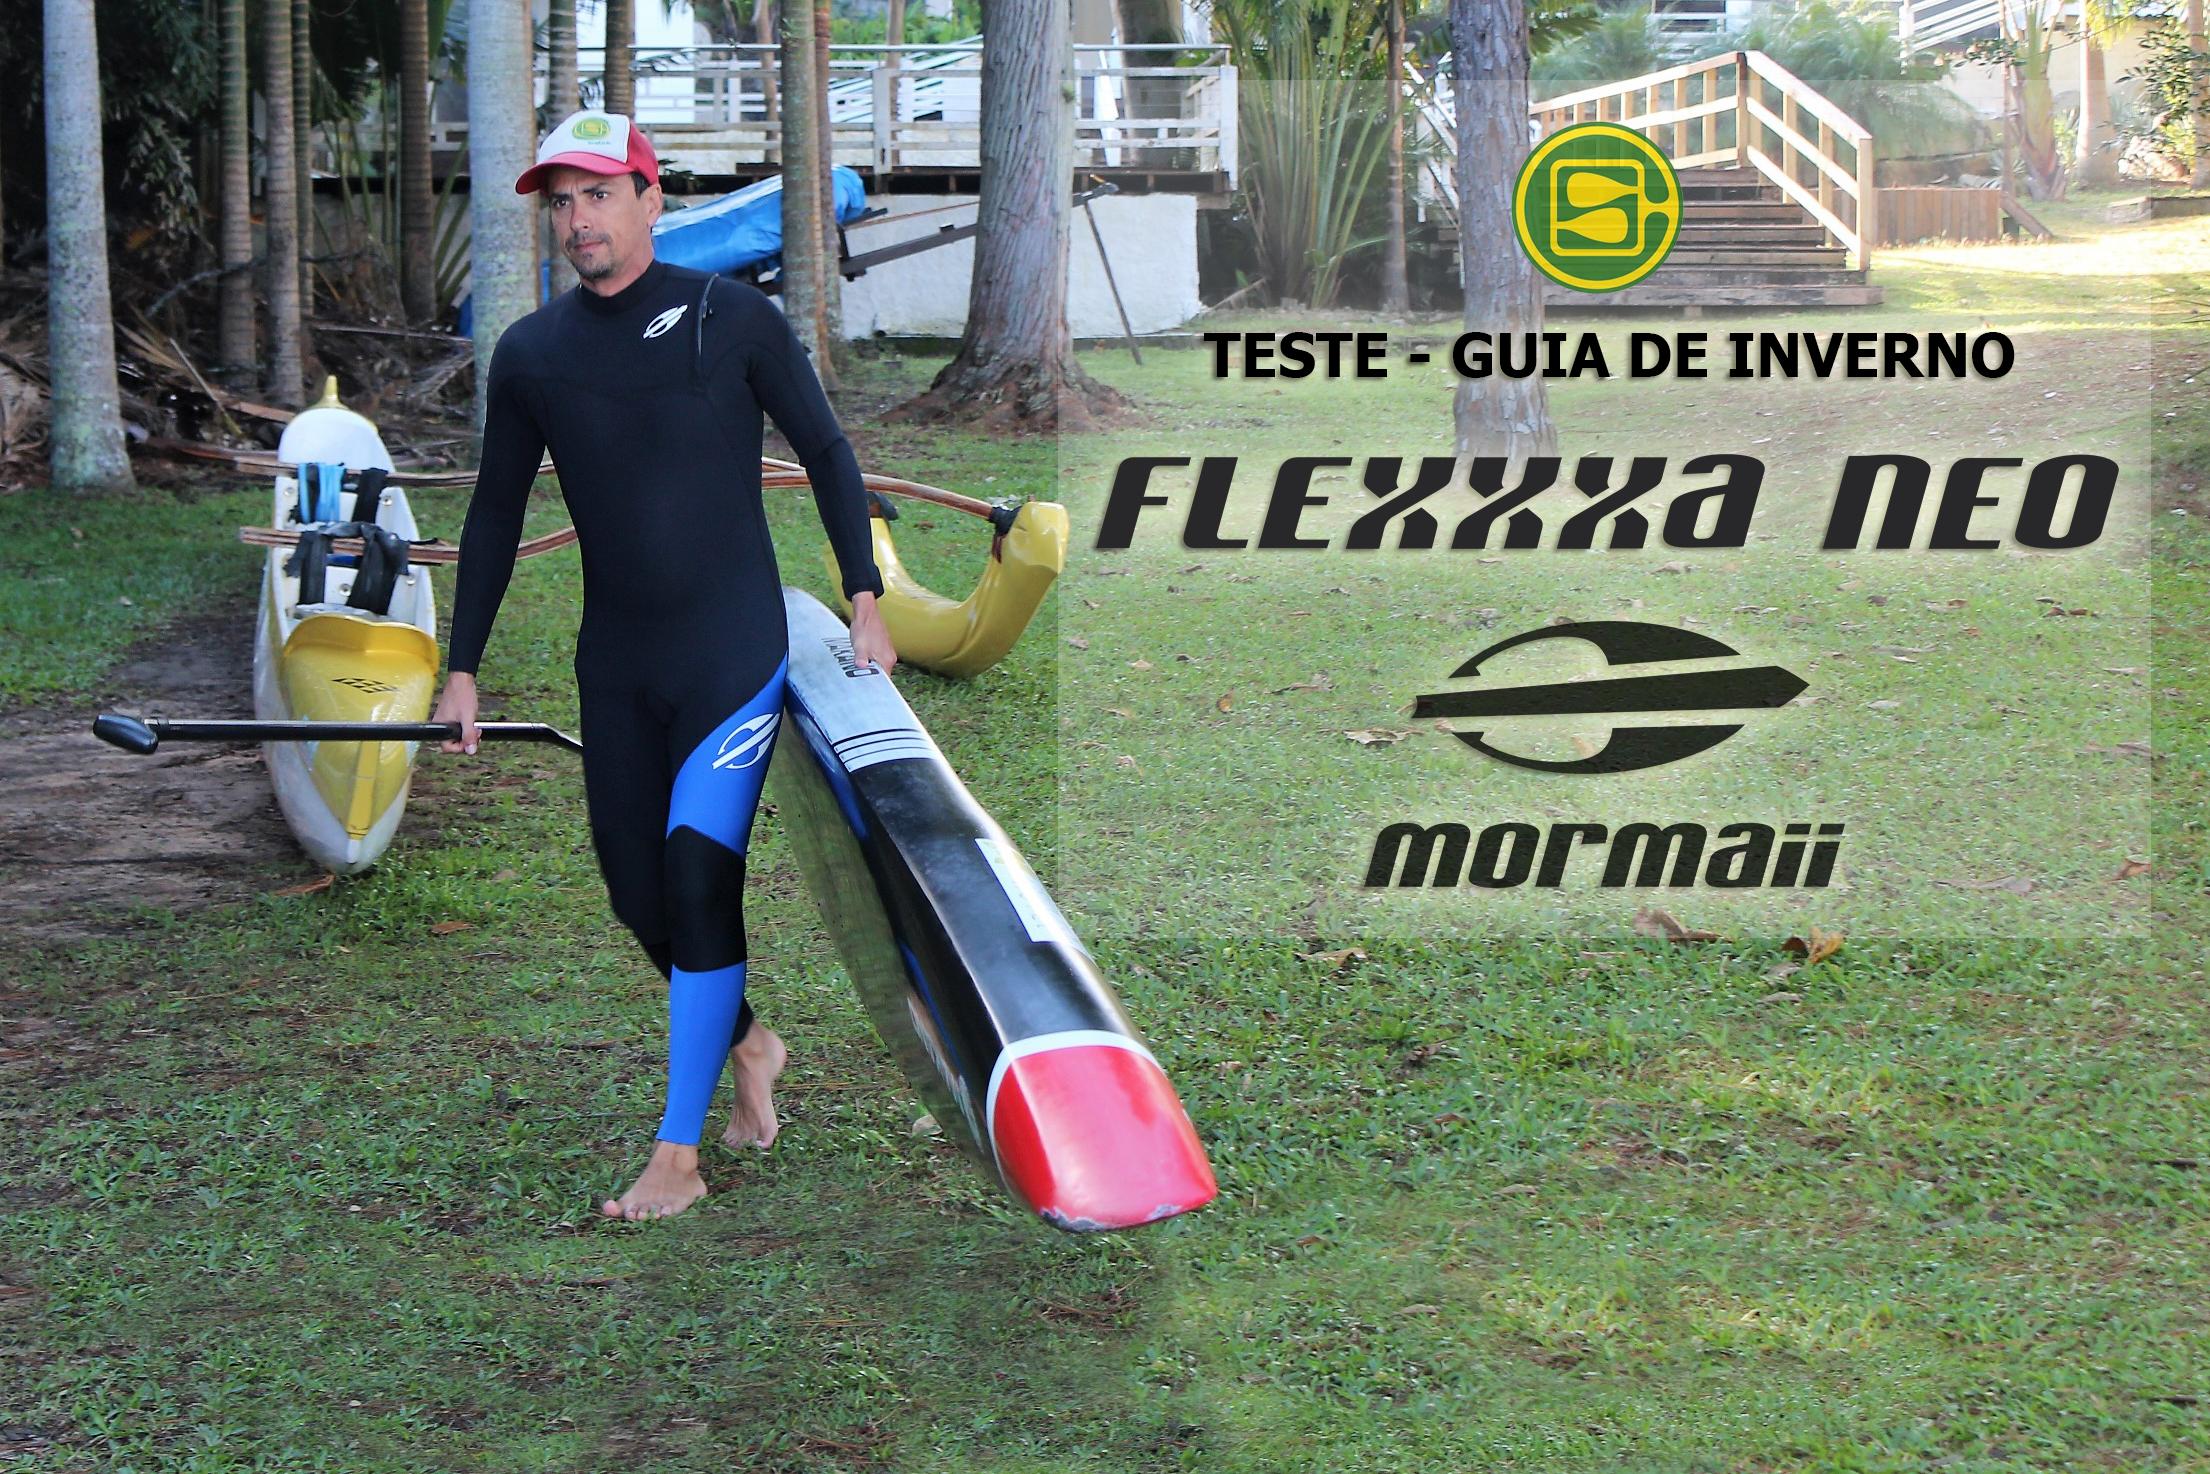 faf57081647c1 Teste Guia de Inverno - Wetsuit Mormaii Flexxxa Neo